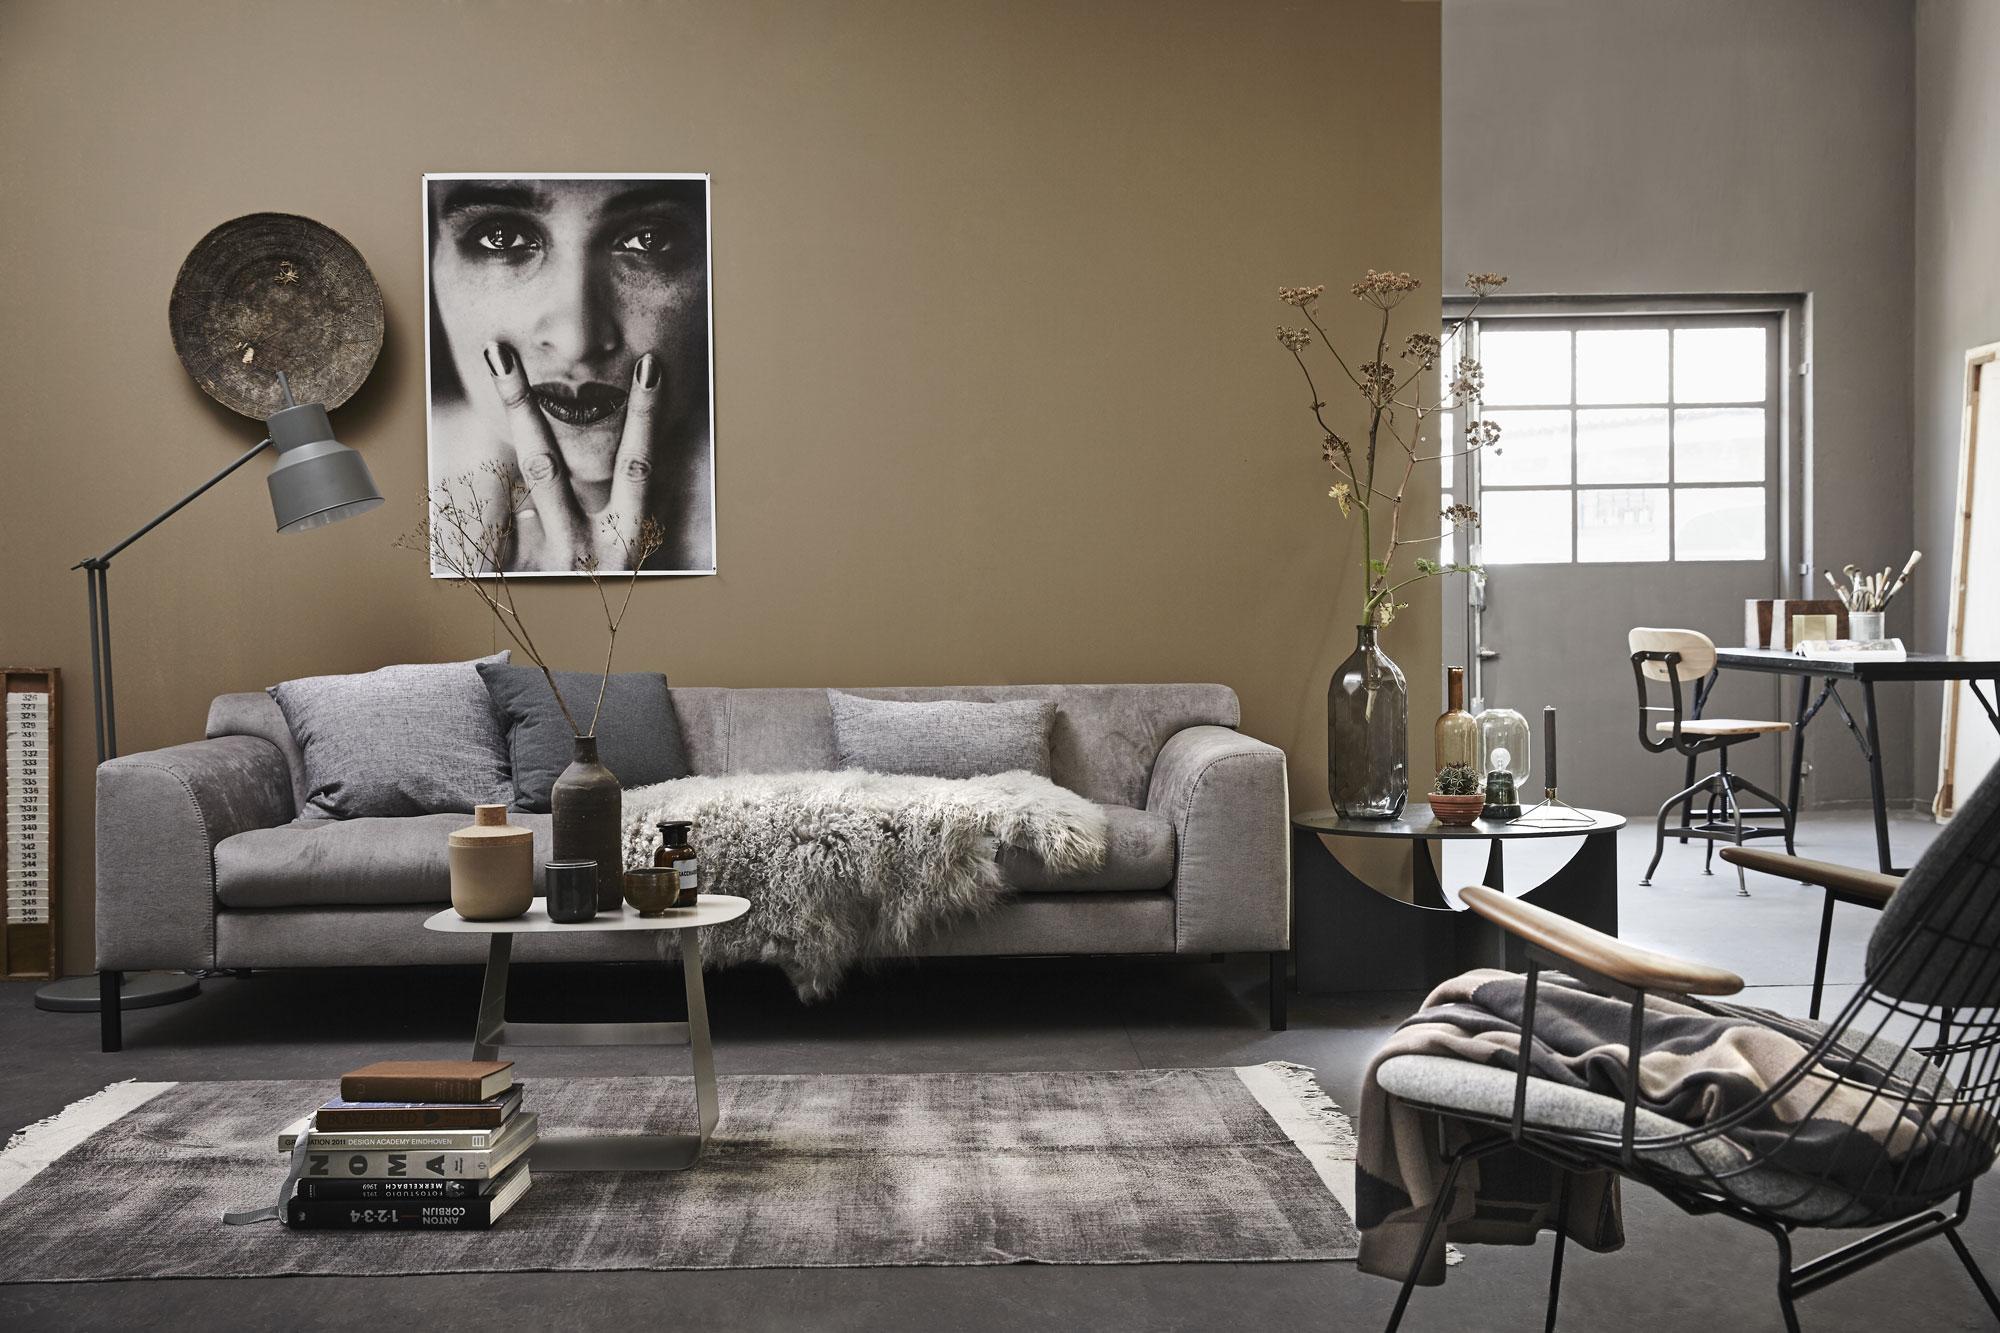 Wonen In Een Warm Nest Zo Breng Je Warmte In Huis Vtwonen